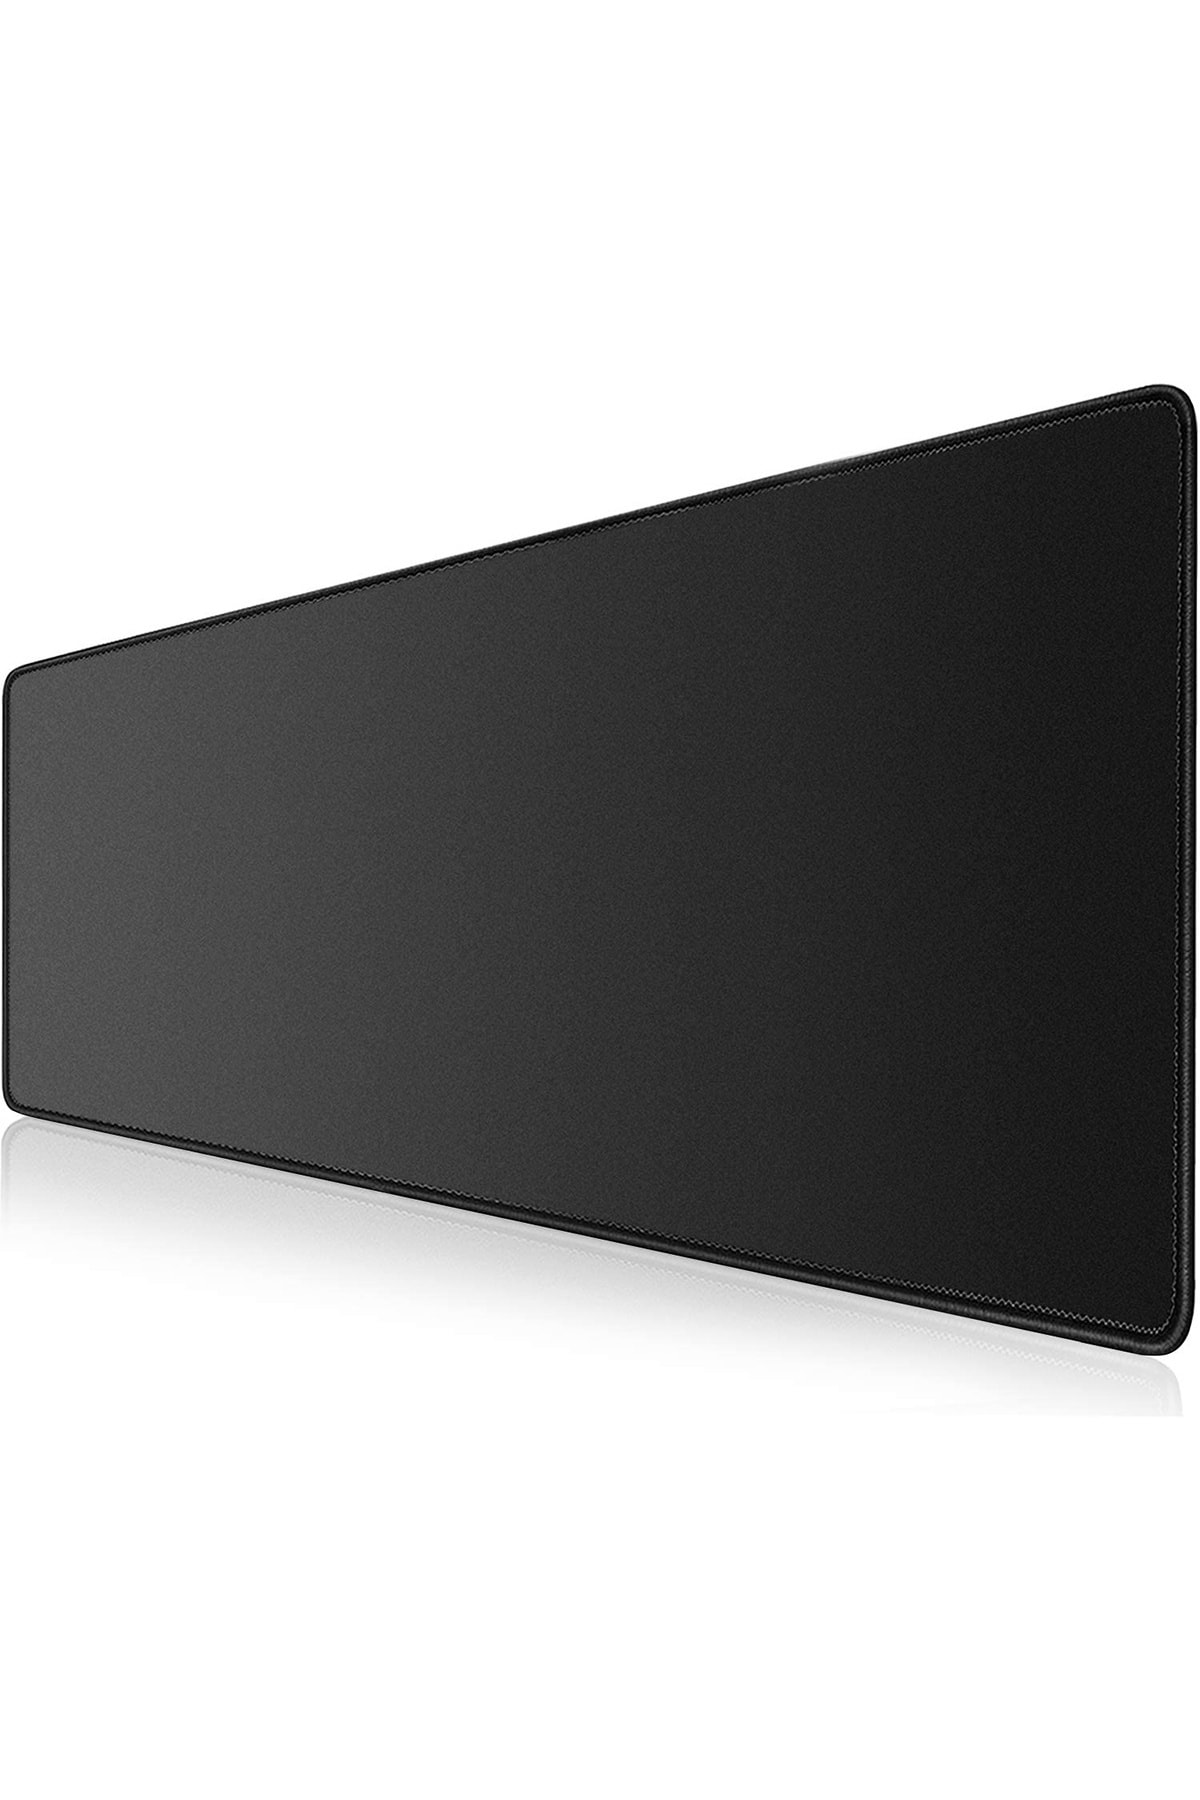 Siyah 90x40 Cm Xxl Gaming Oyuncu Mousepad